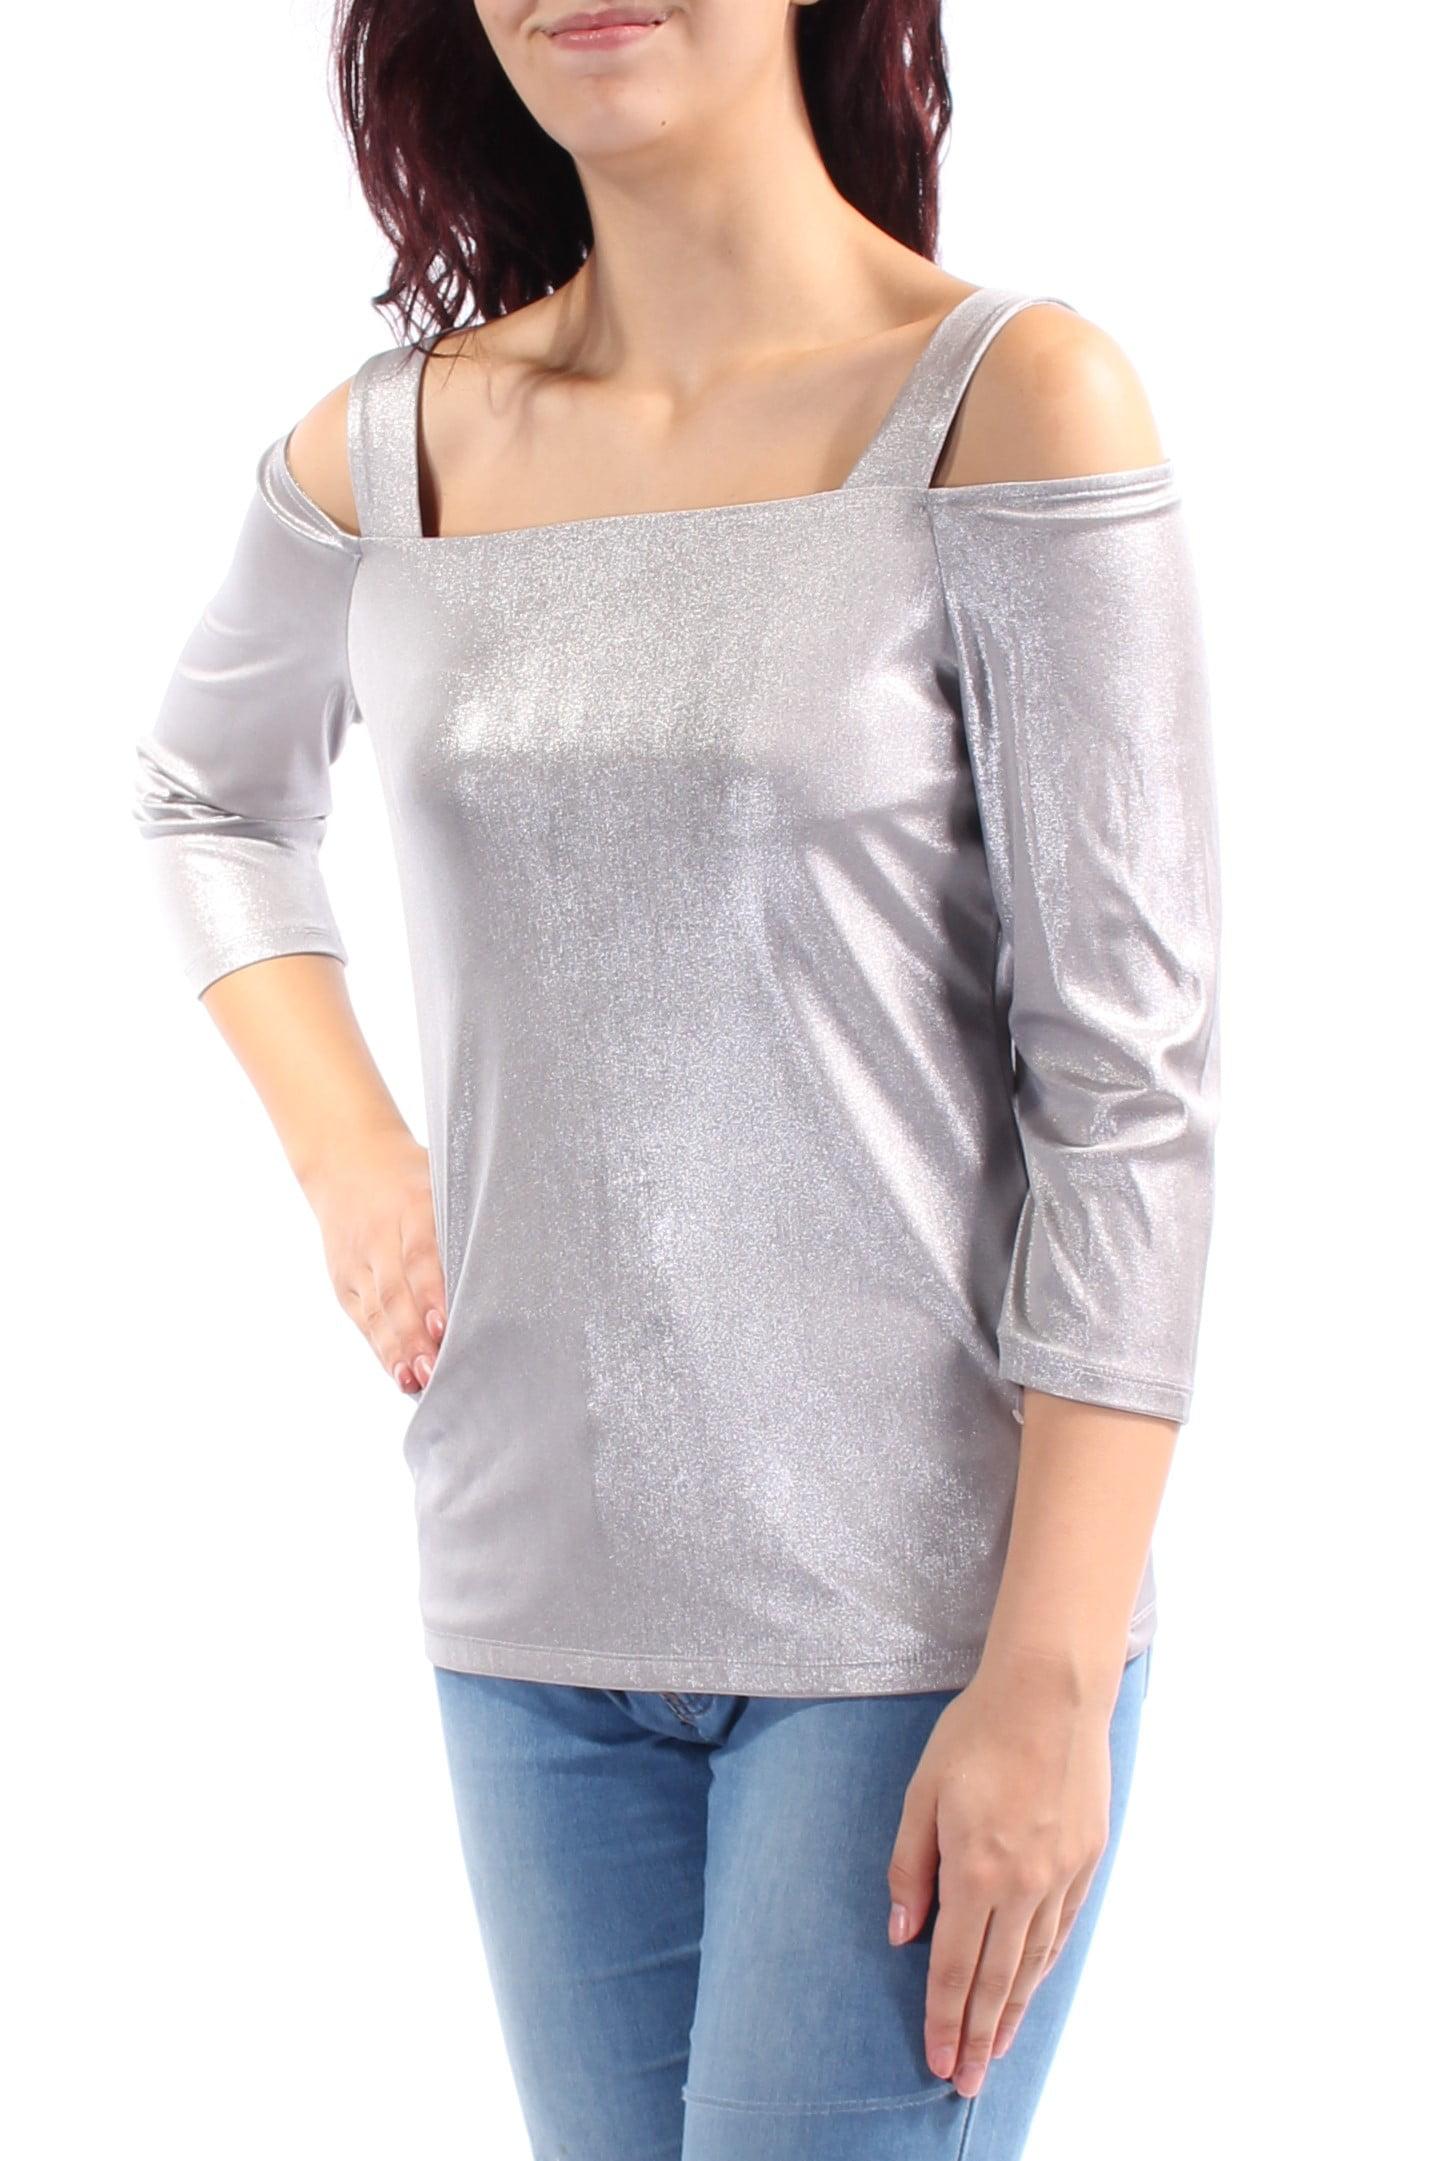 INC Womens Colorblock Surplice Long Sleeves Blouse Top BHFO 9833